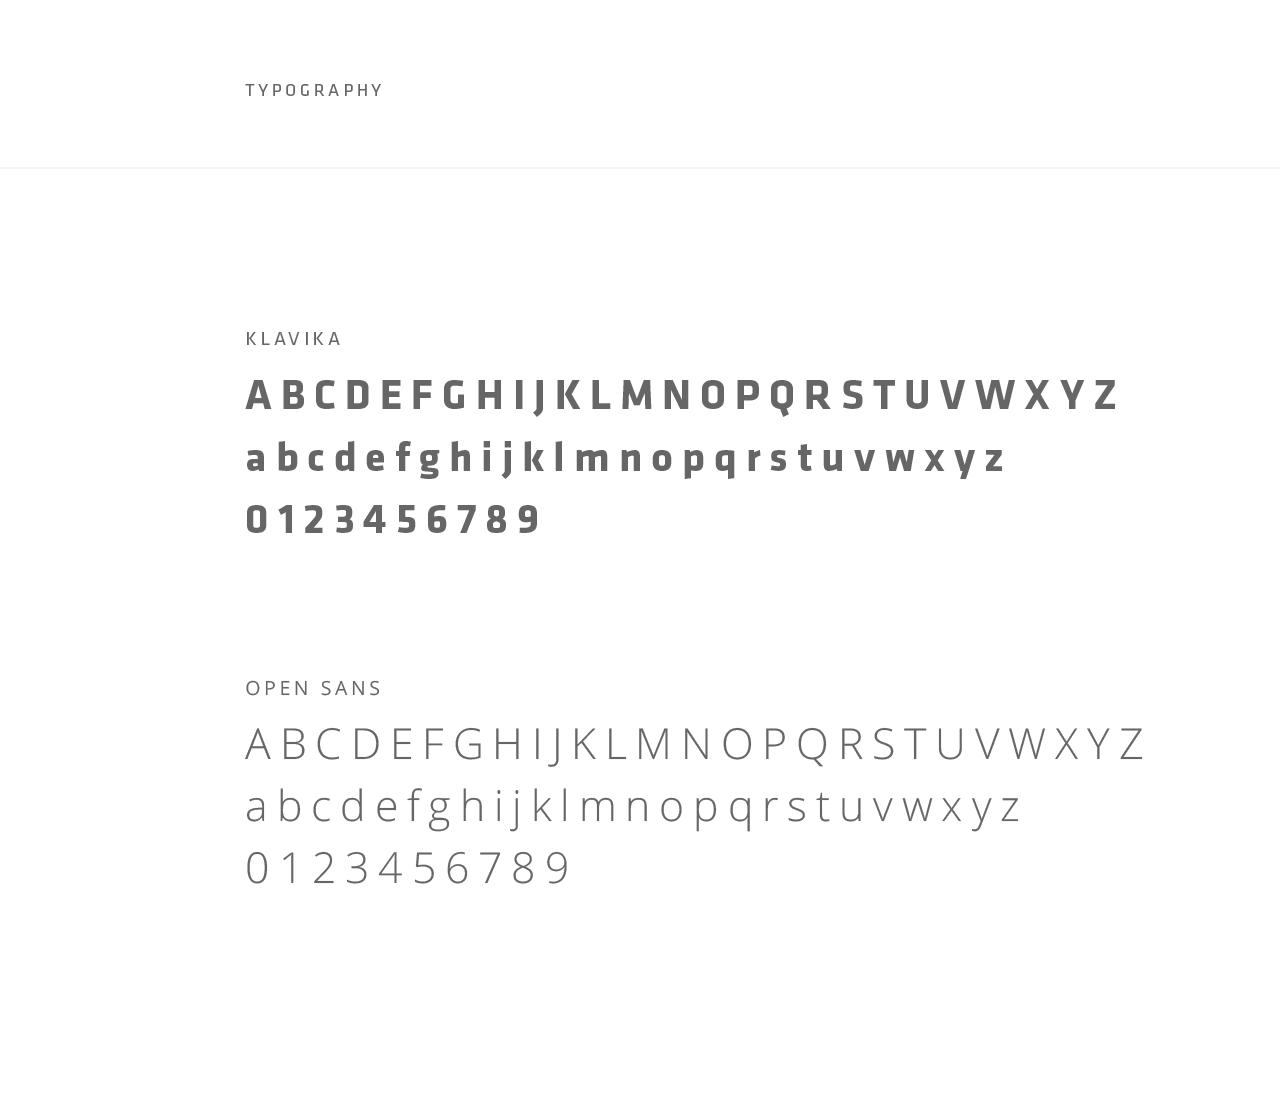 cta-conf-typograhy